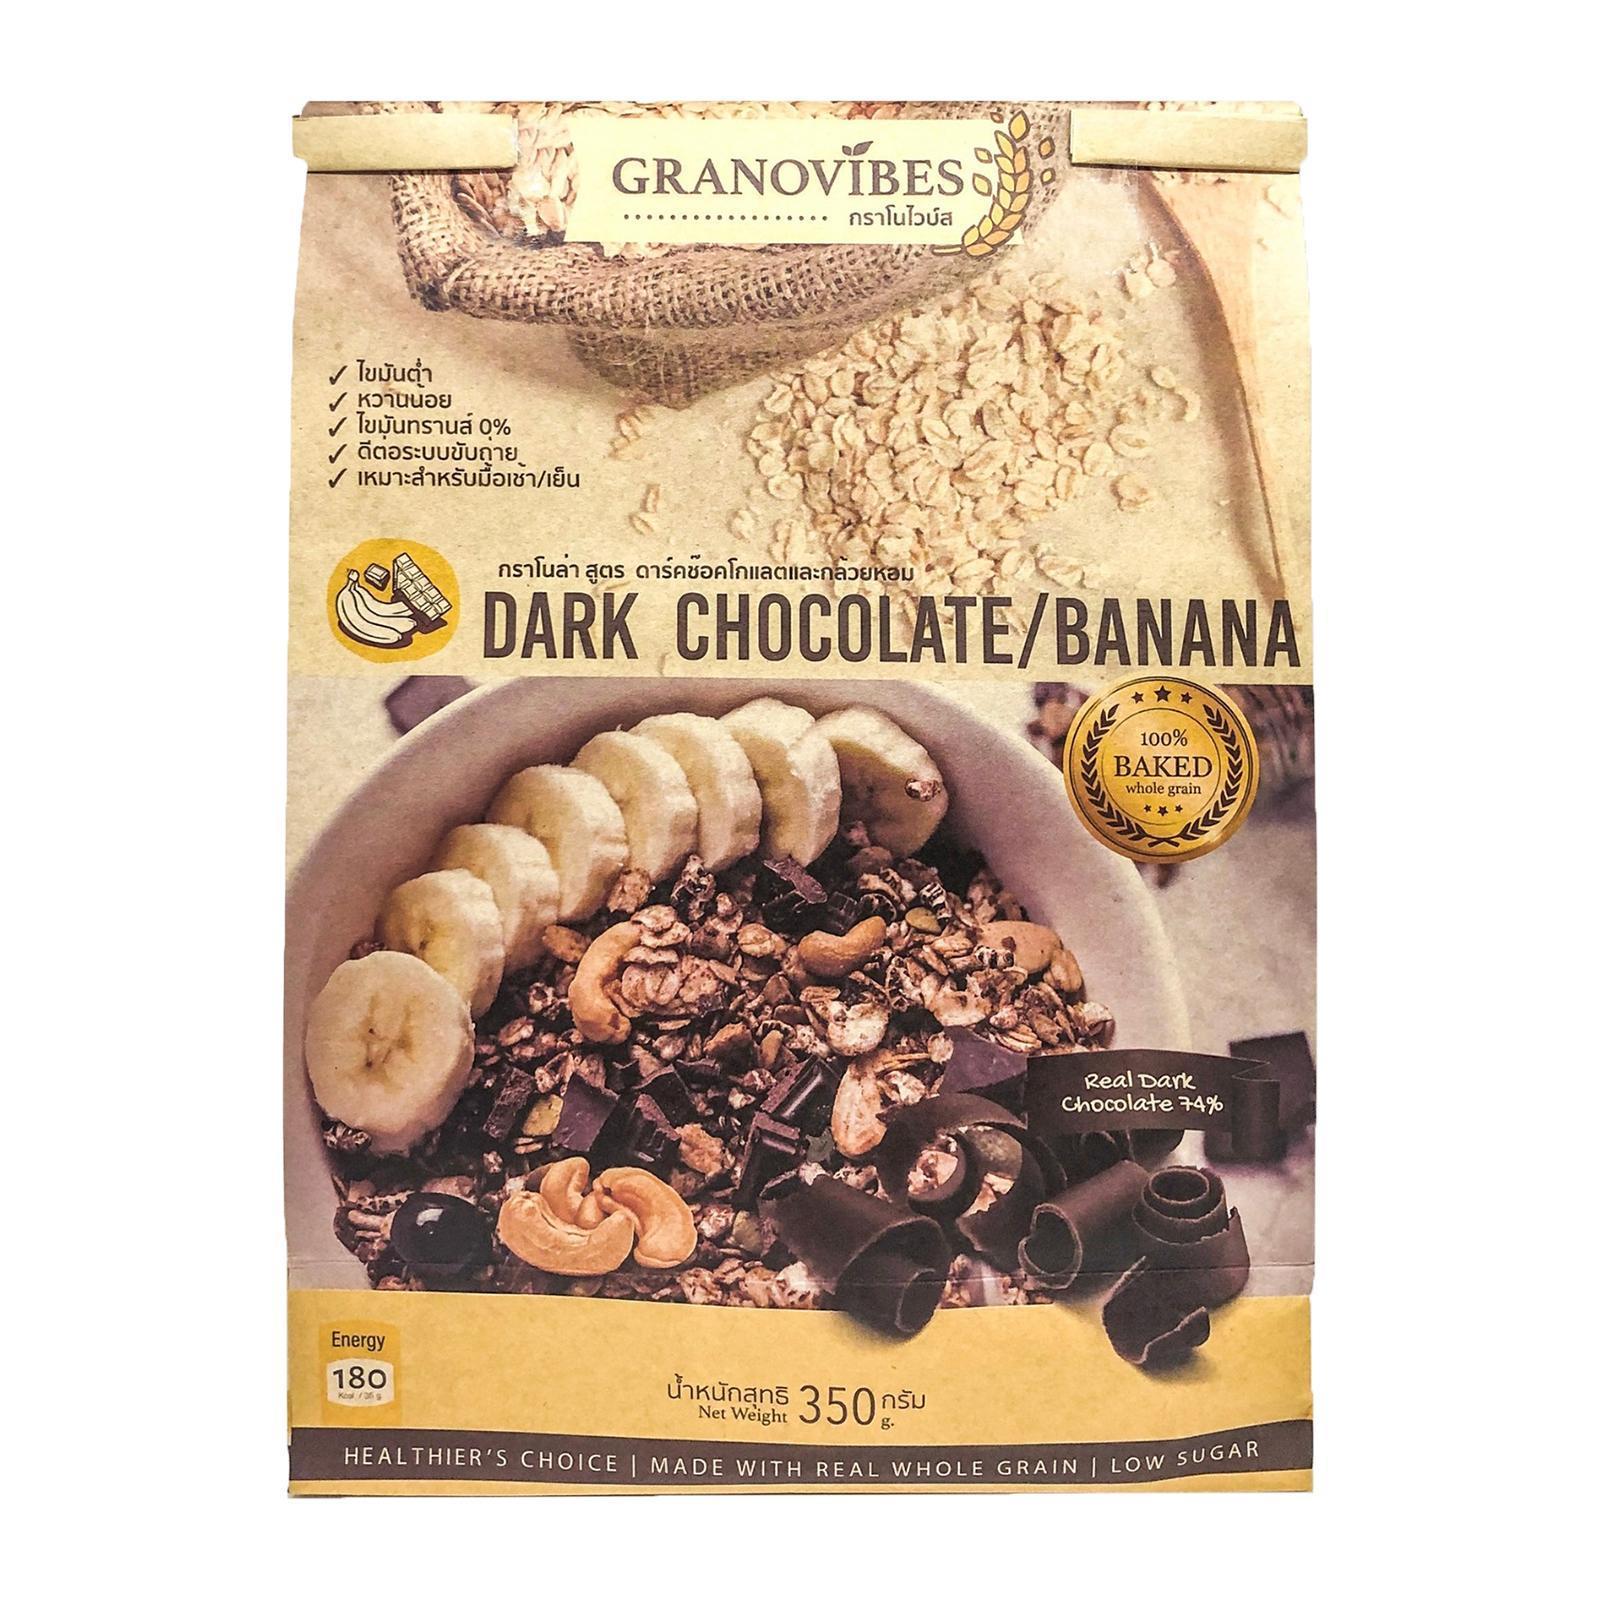 Granovibes Dark Chocolate/Banana - Granola